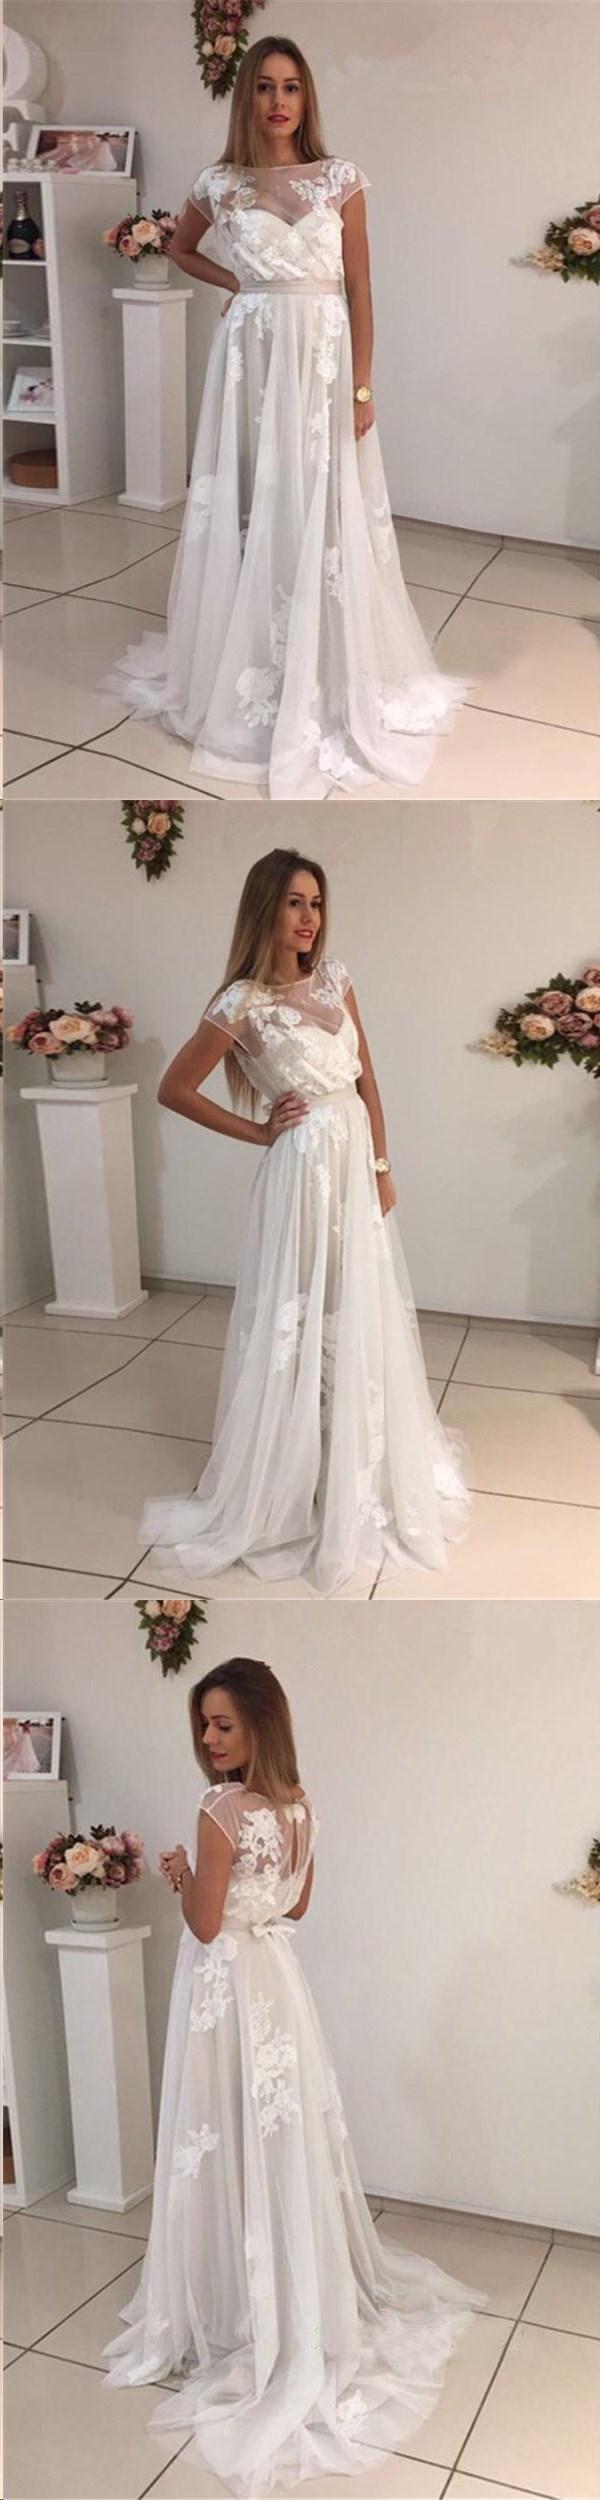 Beautiful prom dresses a line bateau appliques ivory short train